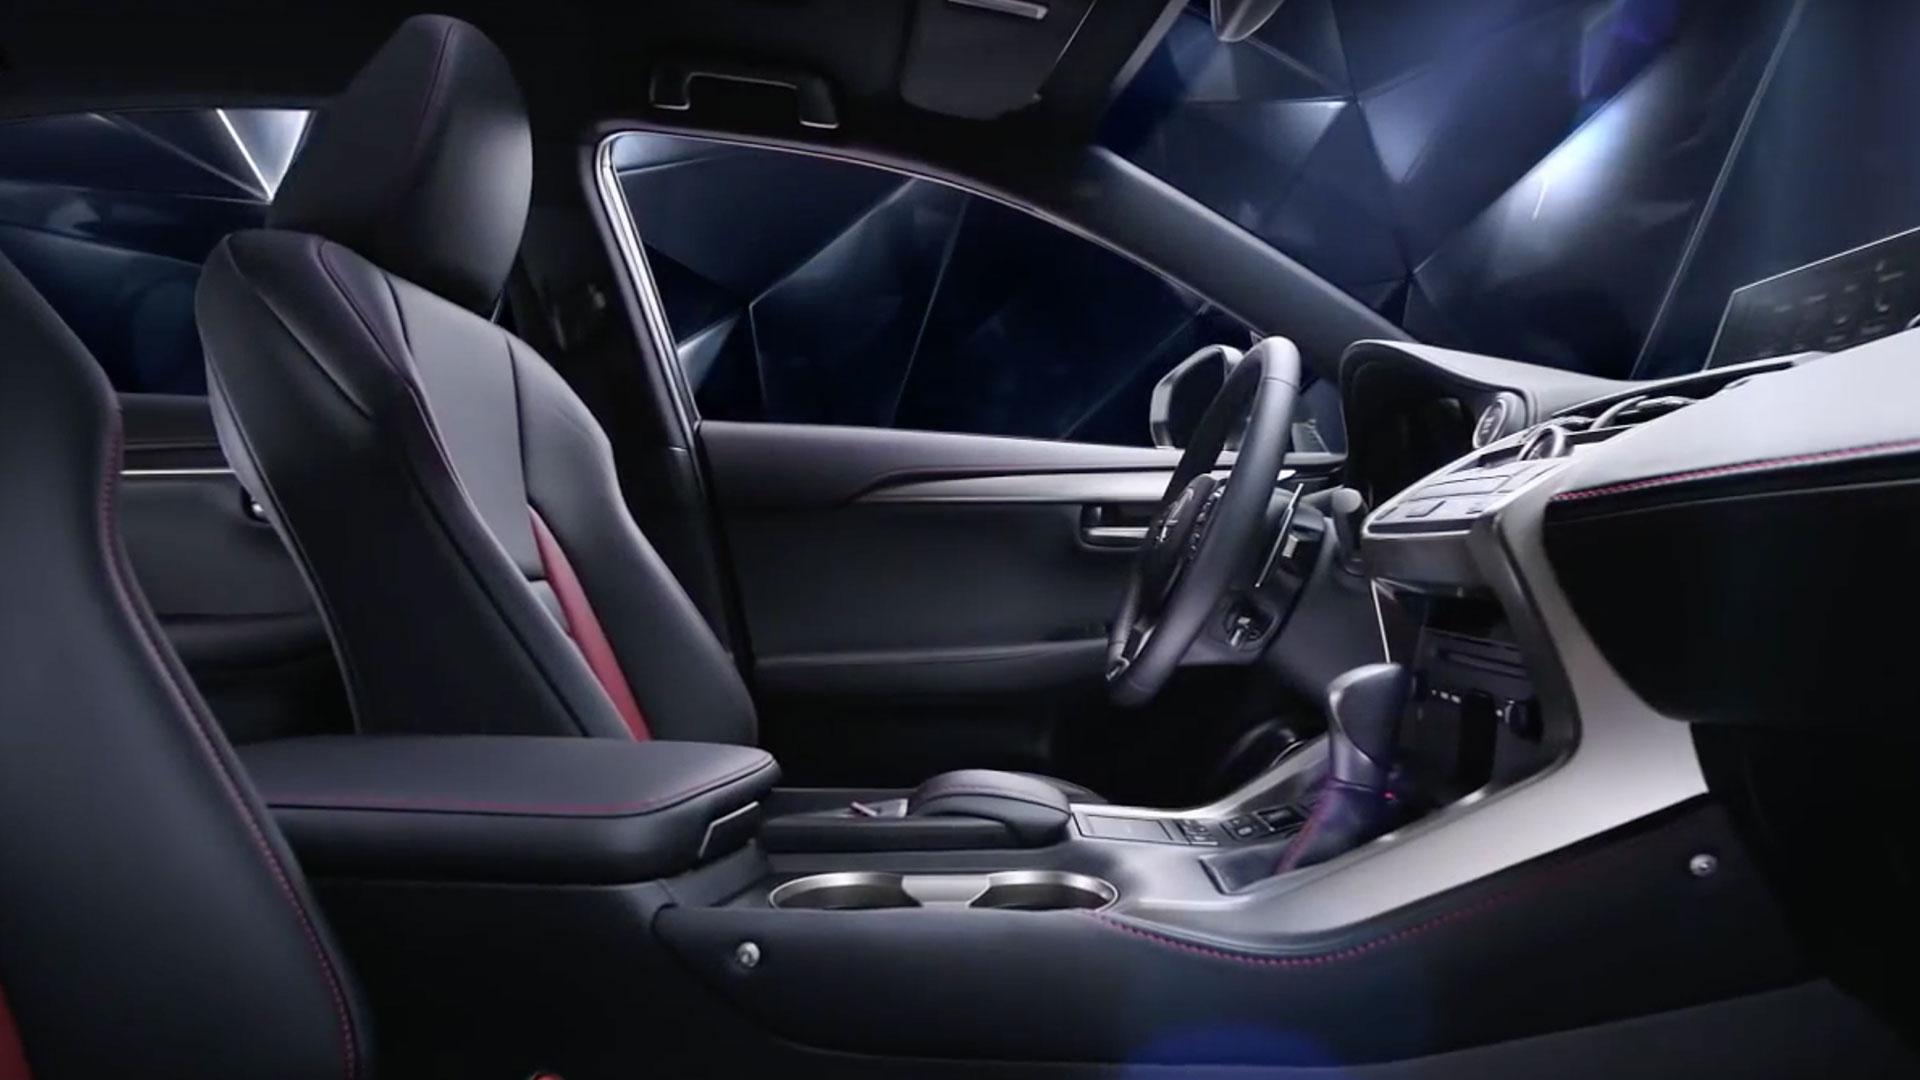 2017 lexus nx 200t inside highlights